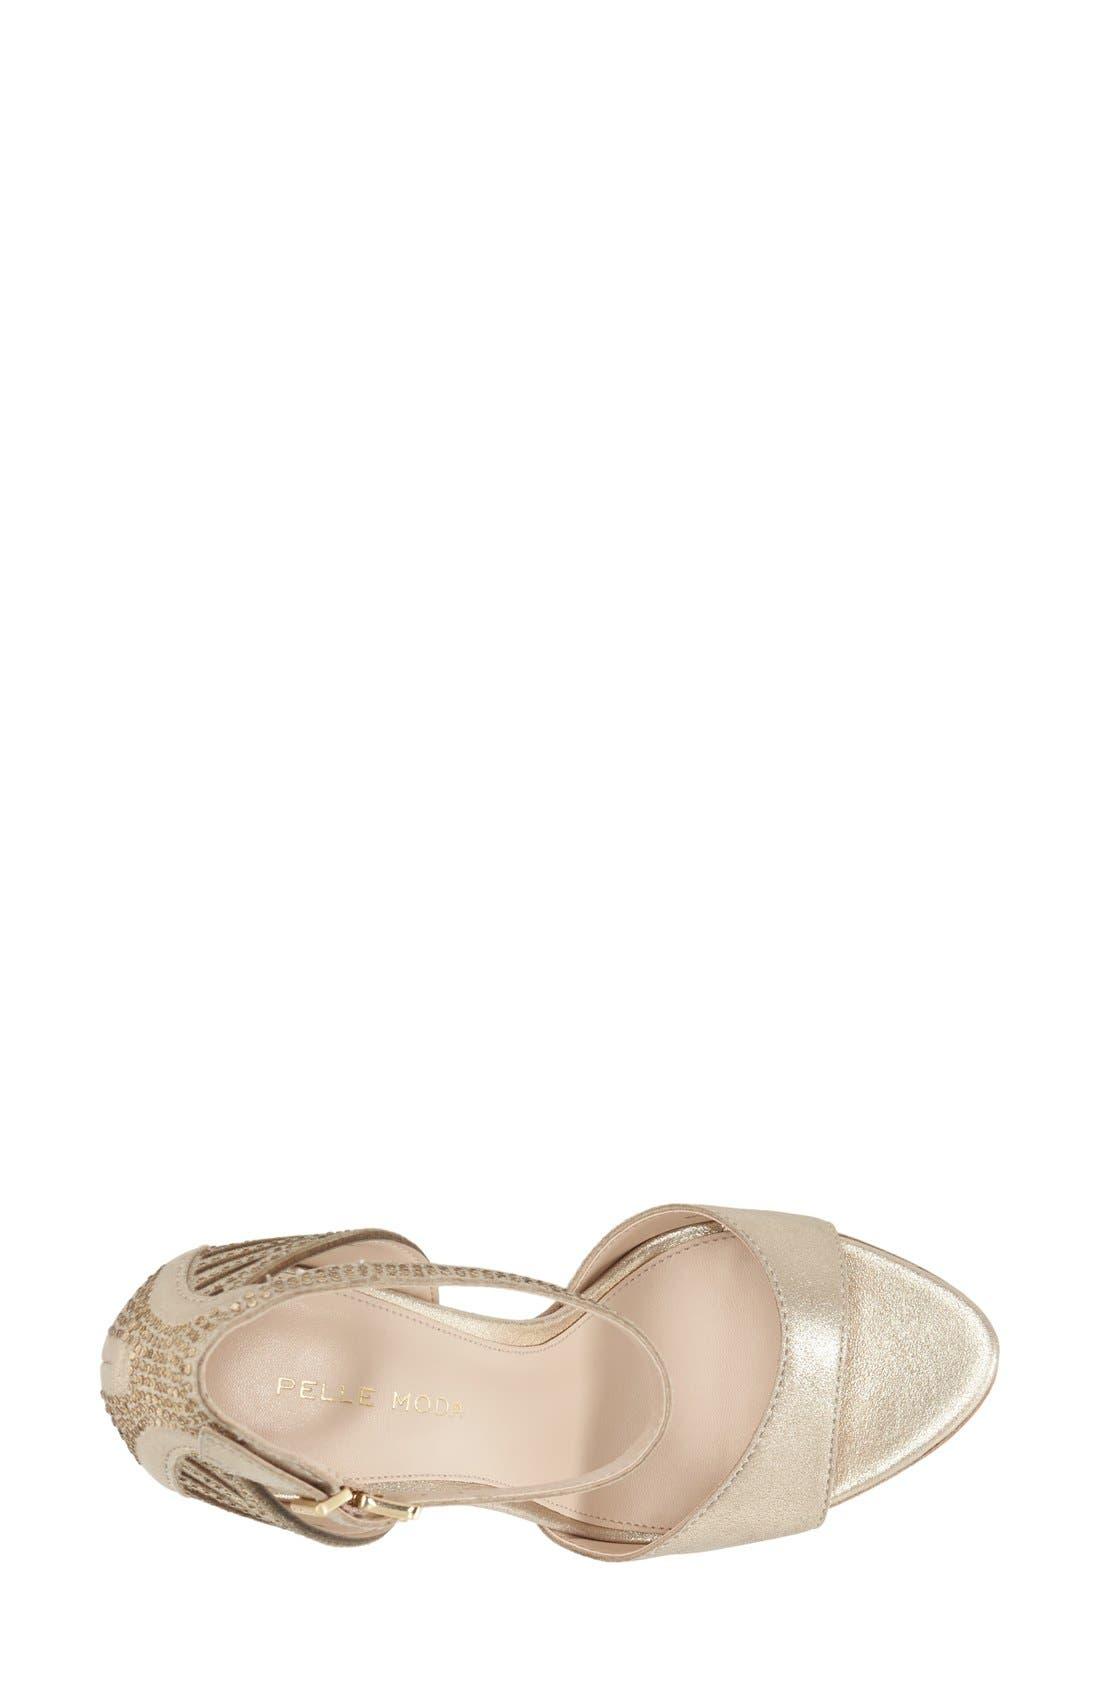 'Fenton' Ankle Strap Sandal,                             Alternate thumbnail 14, color,